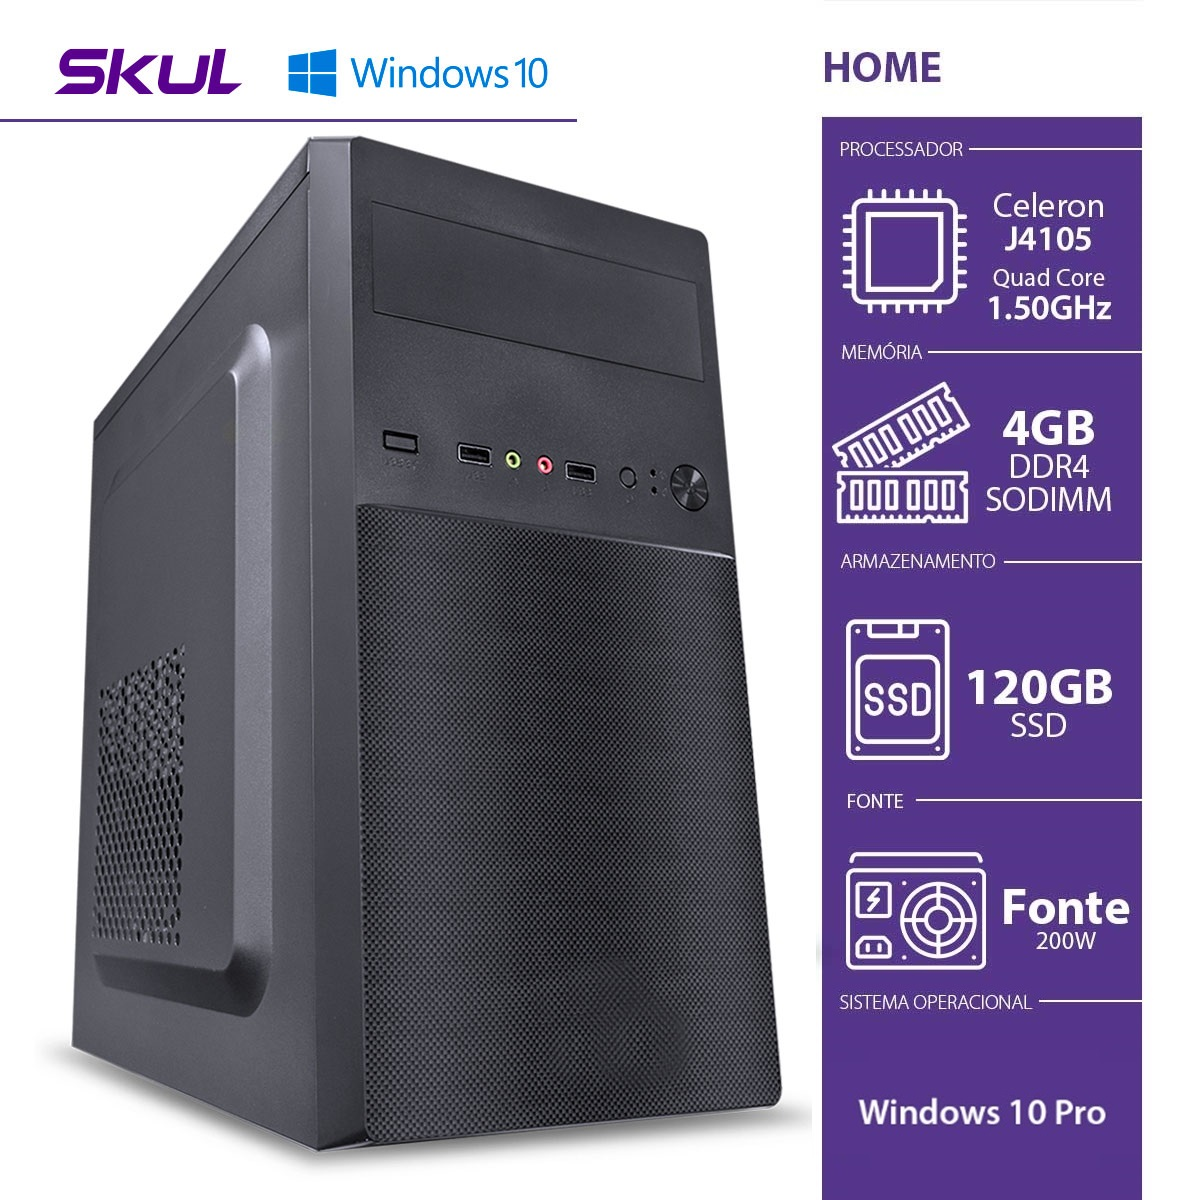 COMPUTADOR HOME H100 - CELERON QUAD CORE J4105 1.50GHZ 4GB DDR4 SODIMM SSD 120GB HDMI/VGA FONTE 200W WINDOWS 10 PRO  - Audio Video & cia